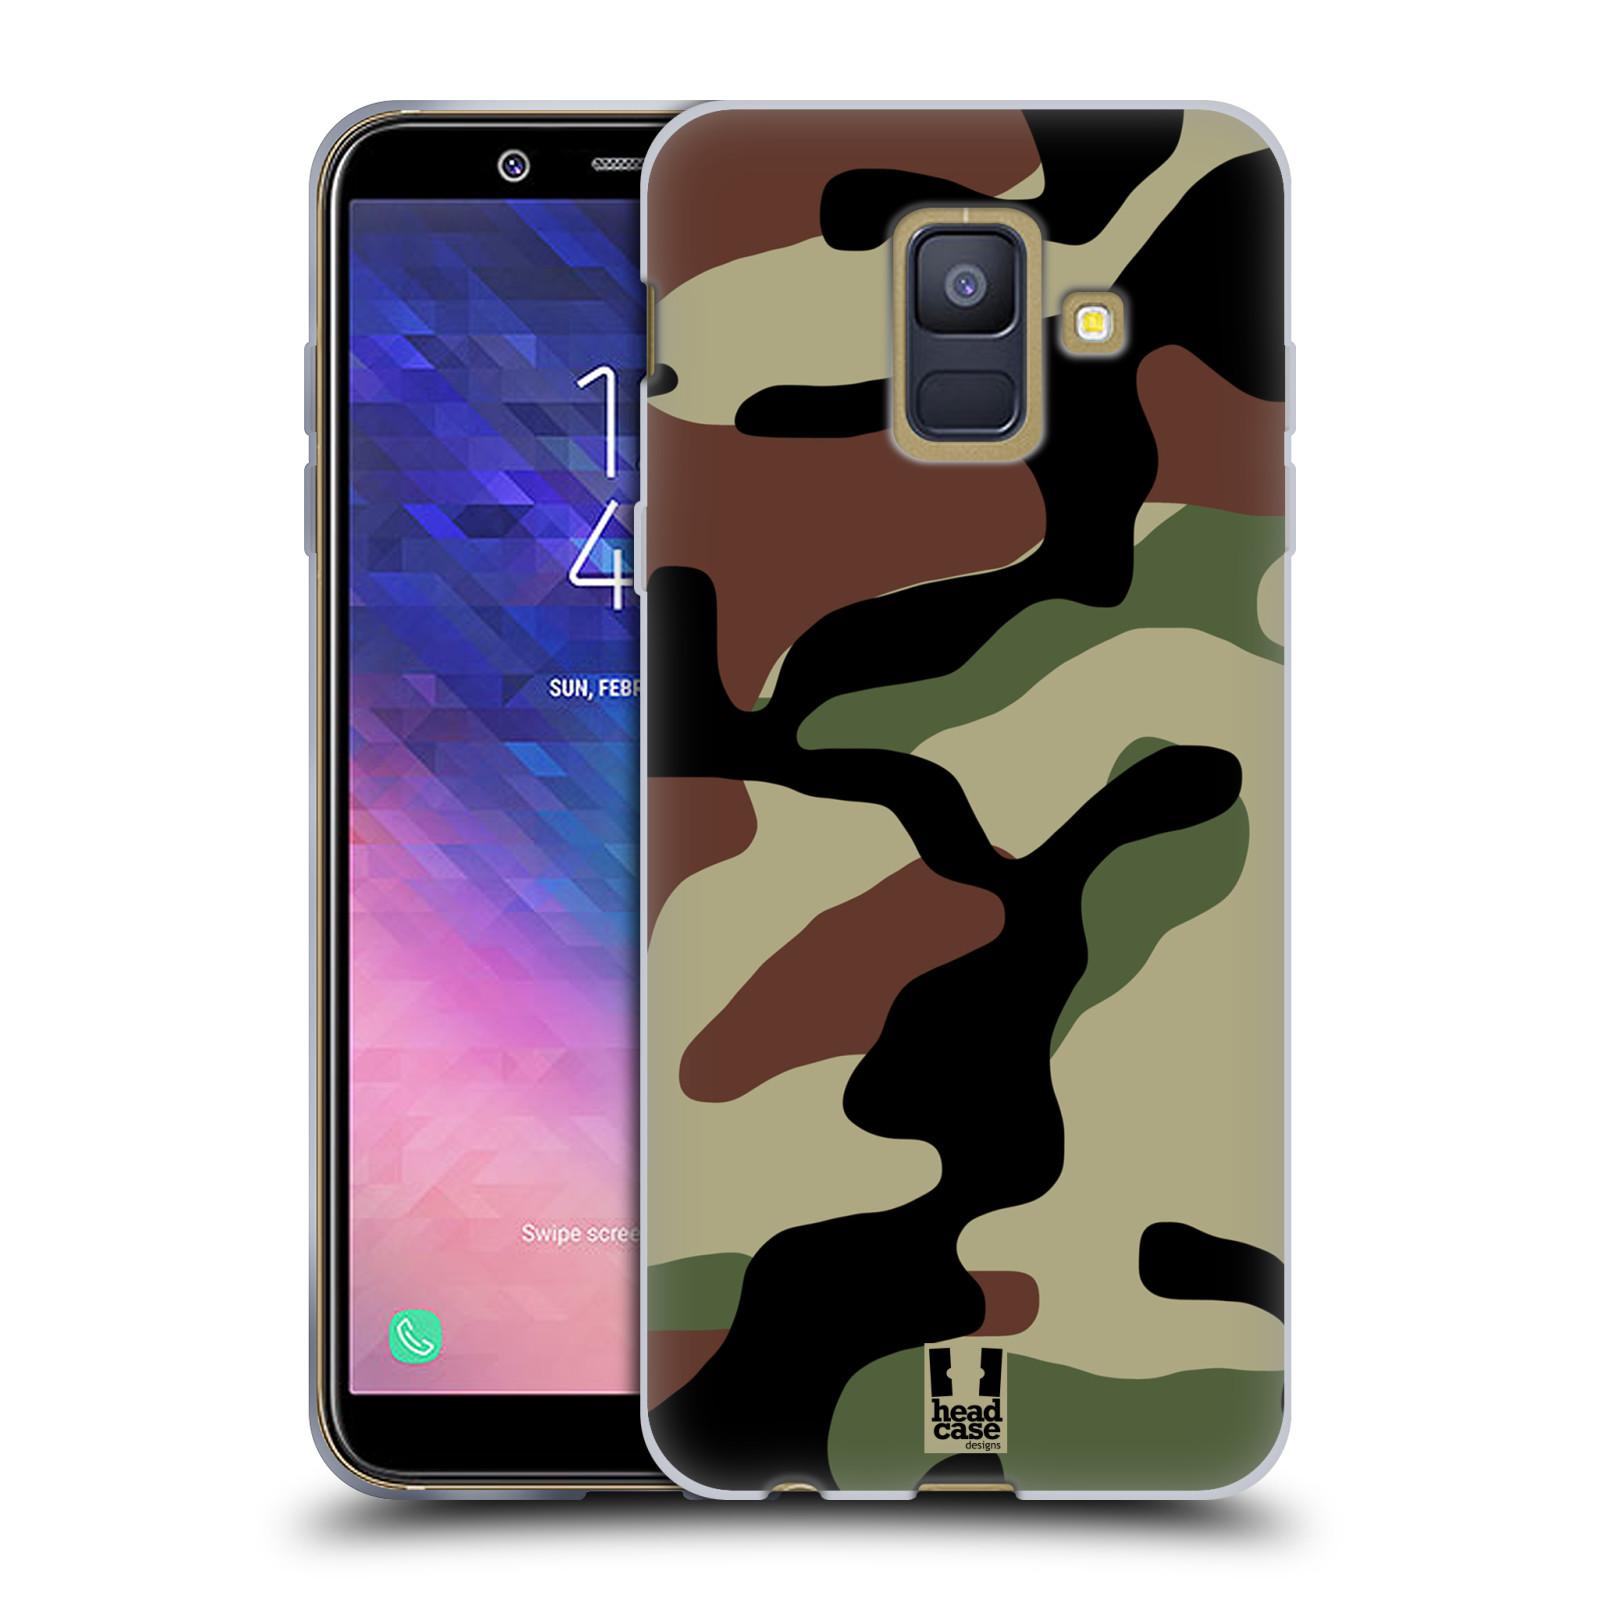 Silikonové pouzdro na mobil Samsung Galaxy A6 (2018) - Head Case - Maskáče